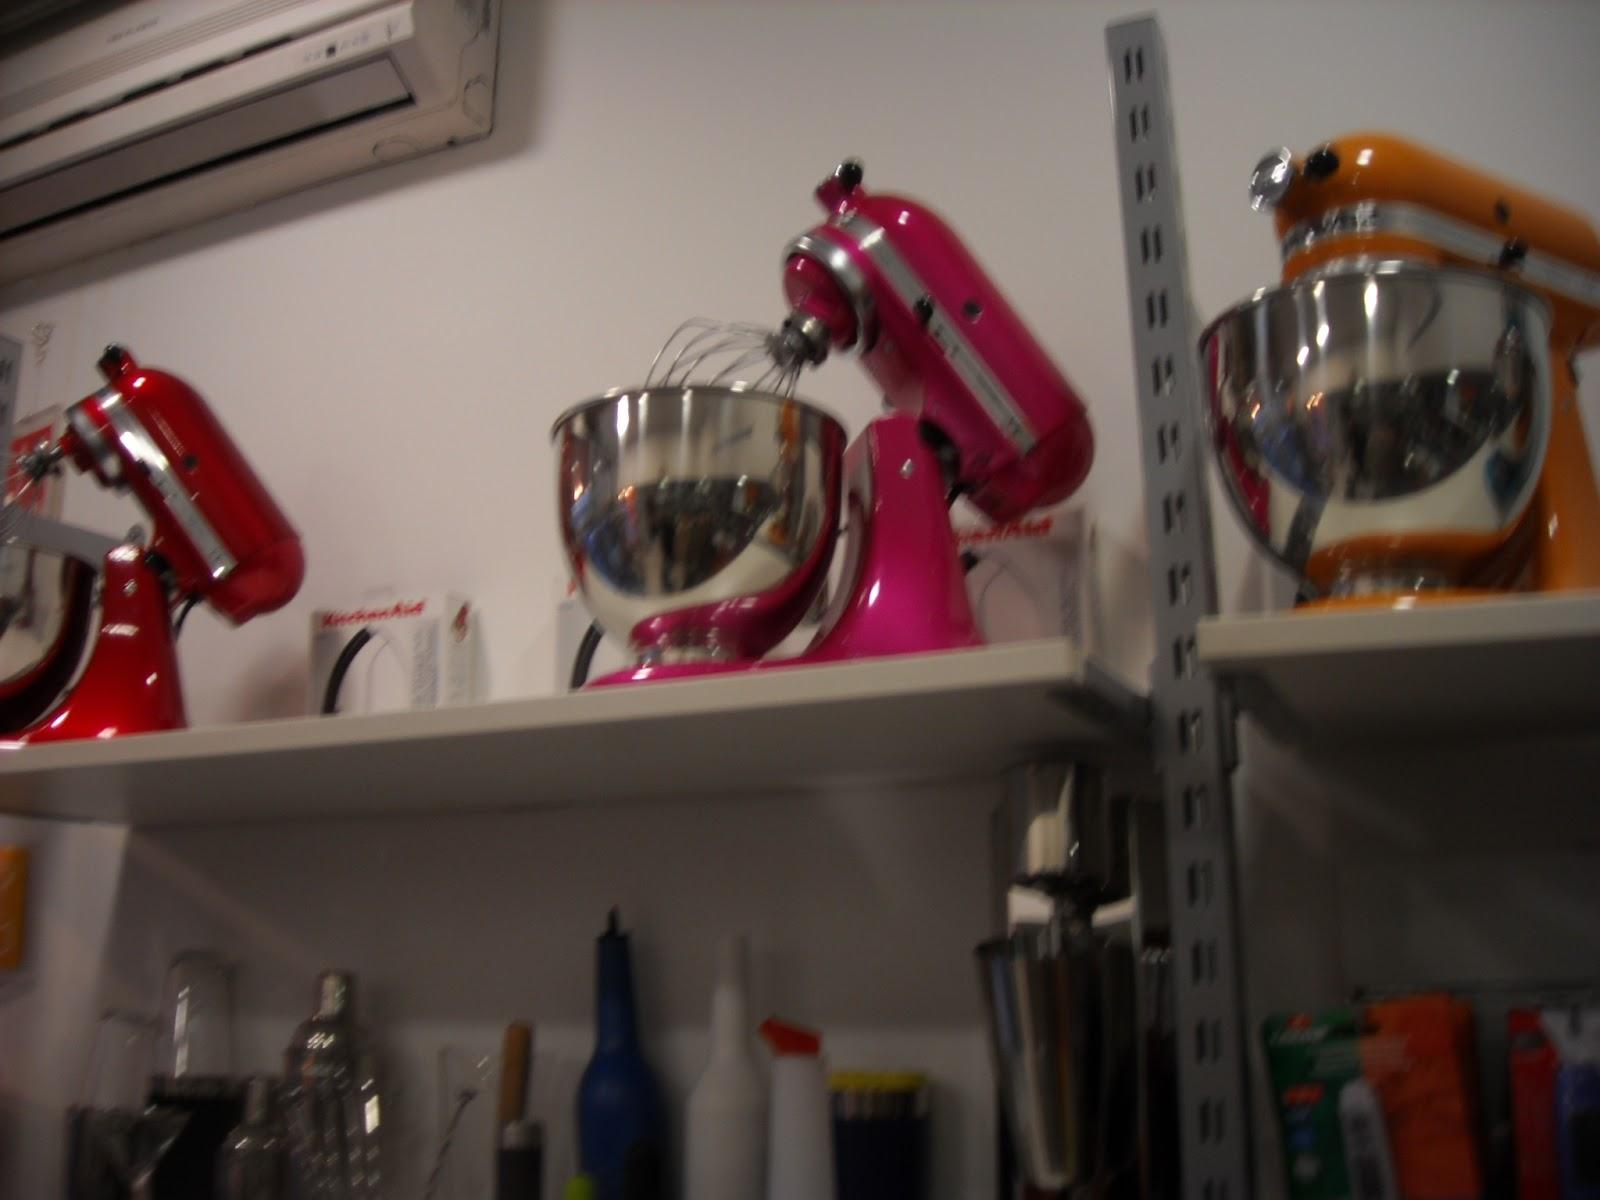 Los utensilios del chef - Los utensilios del chef ...